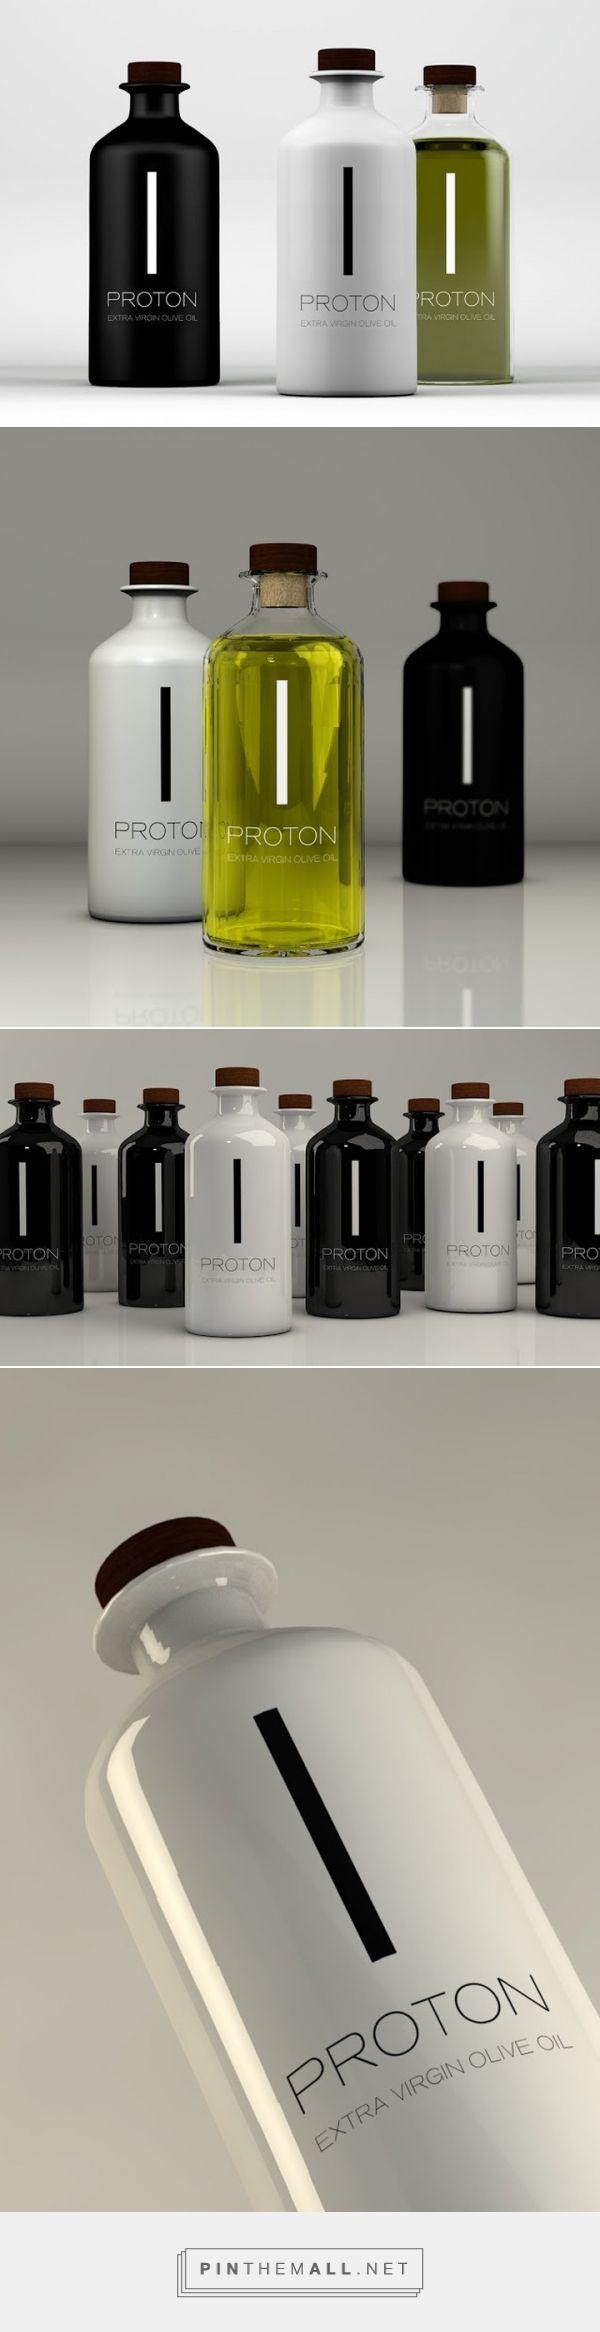 PROTON Premium Extra Virgin Olive Oil by Dimitris Lazaridis